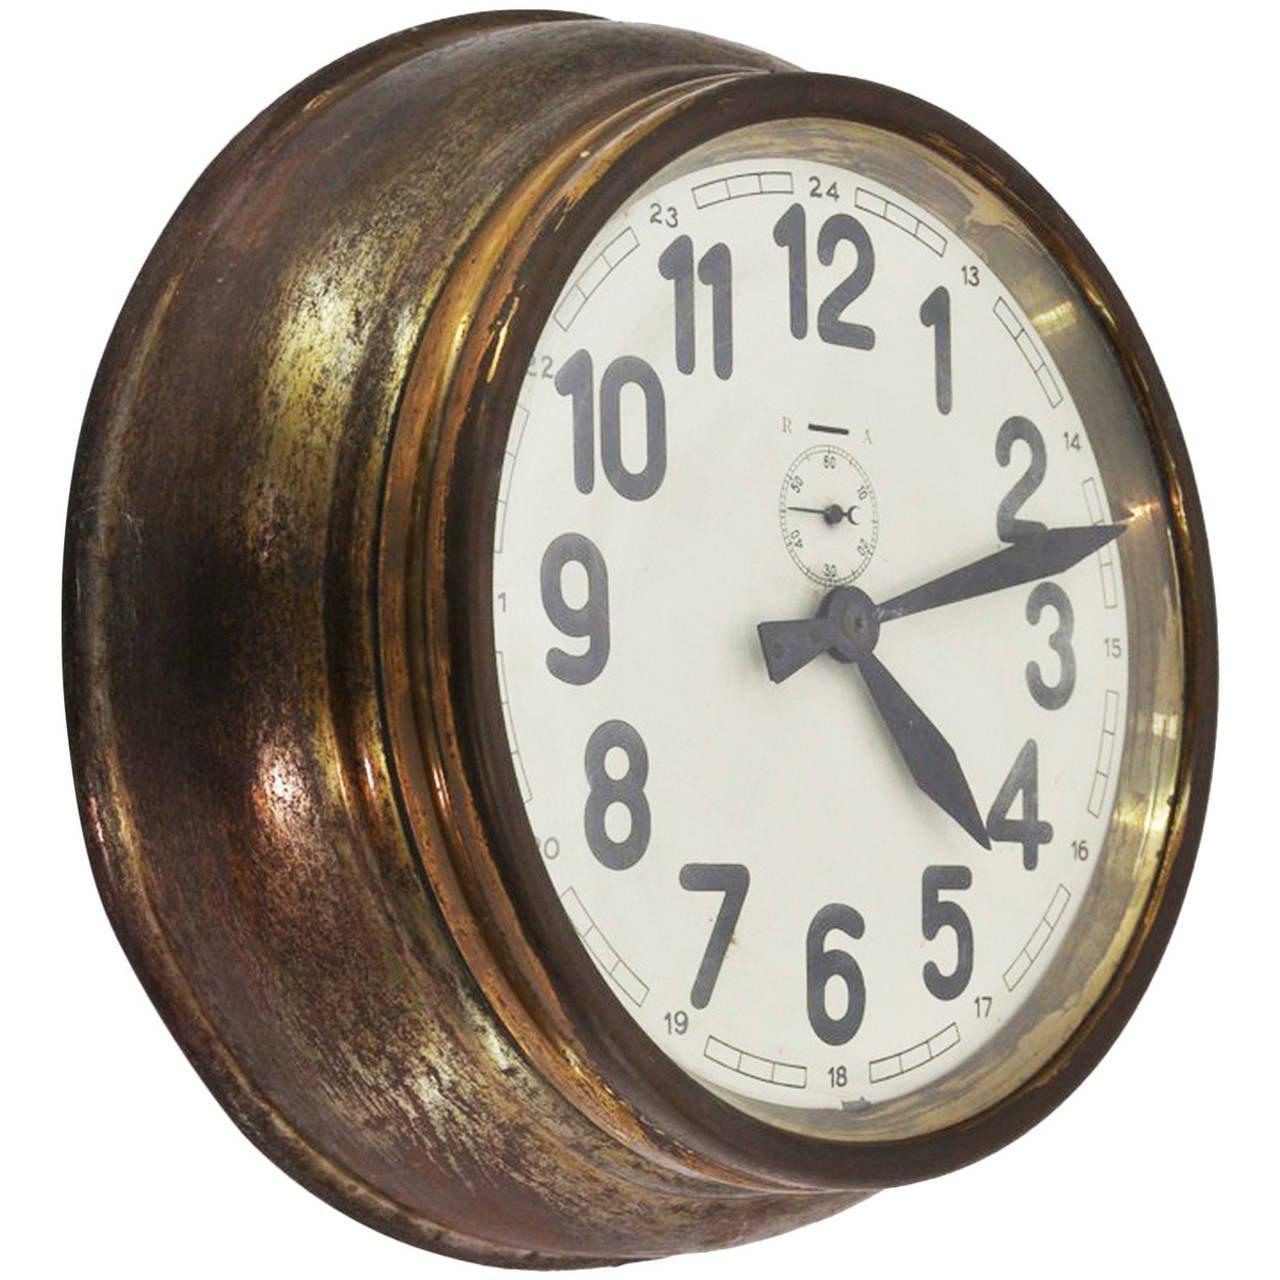 Brass Art Deco Wall Clock At 1Stdibs Inside Art Deco Wall Clocks (Image 10 of 20)